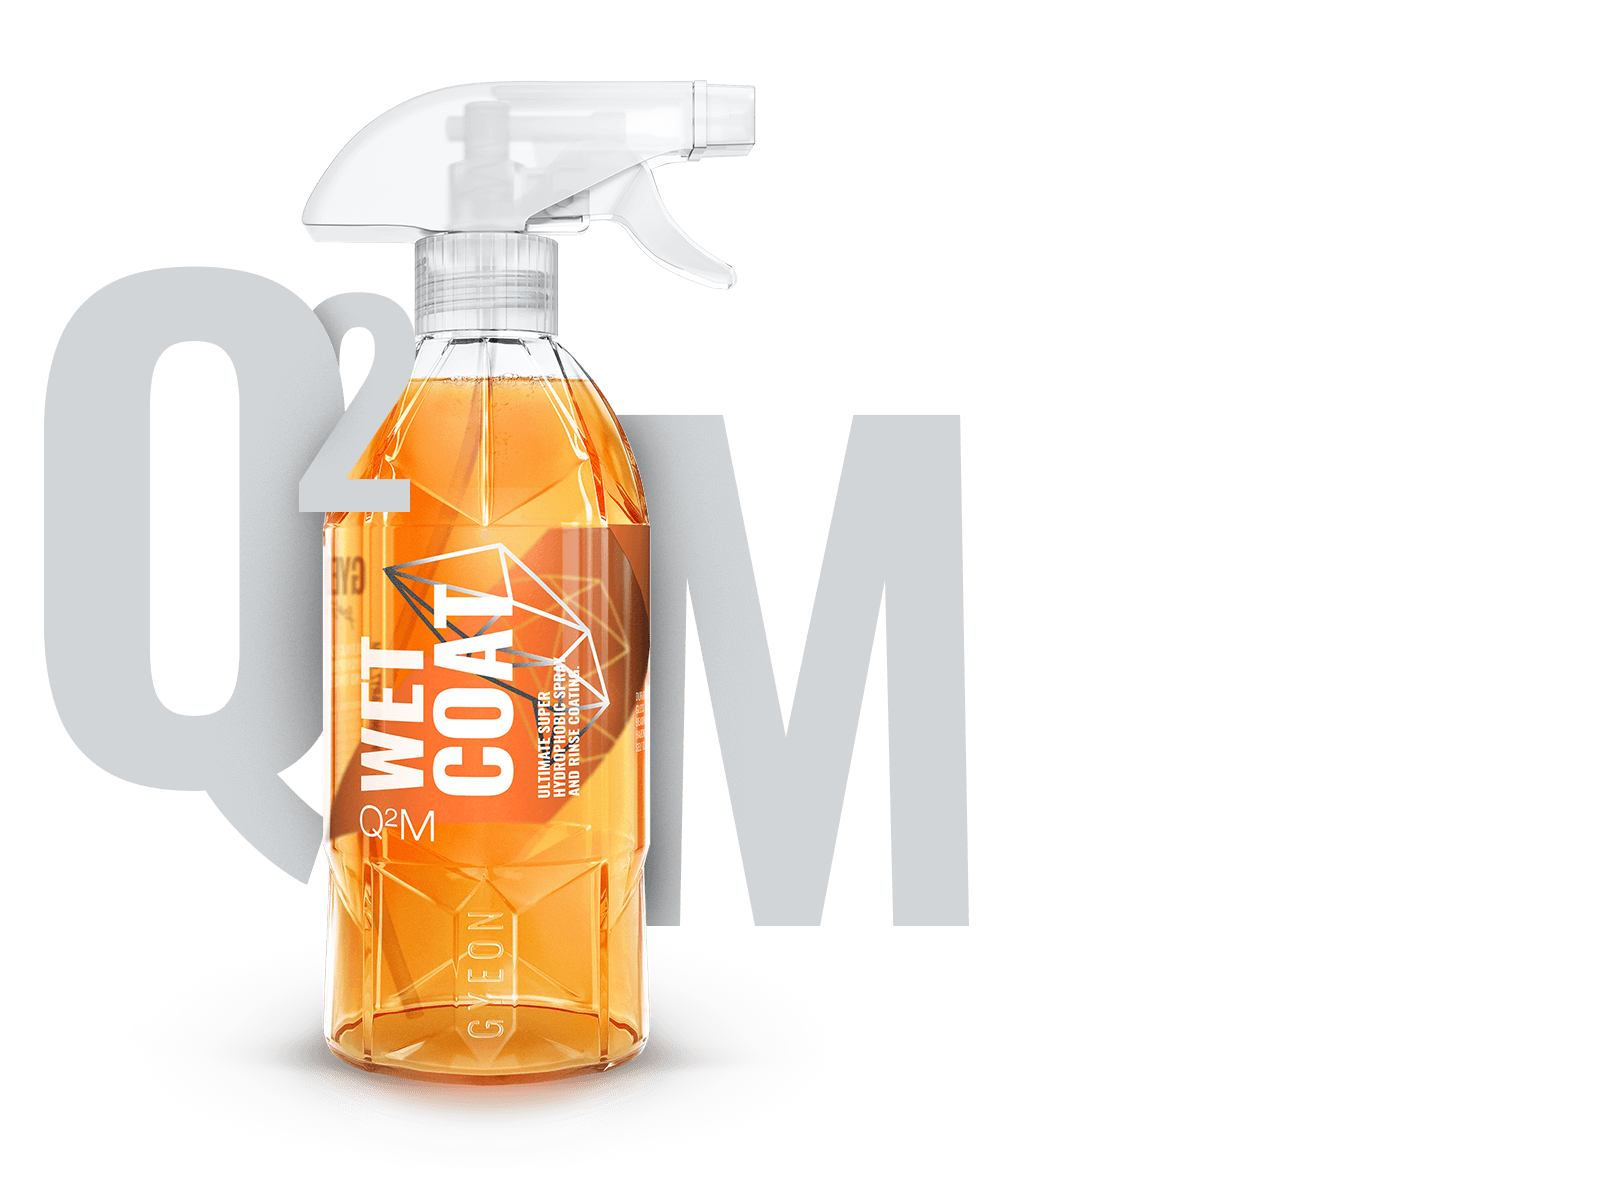 quartz based self-cleaning